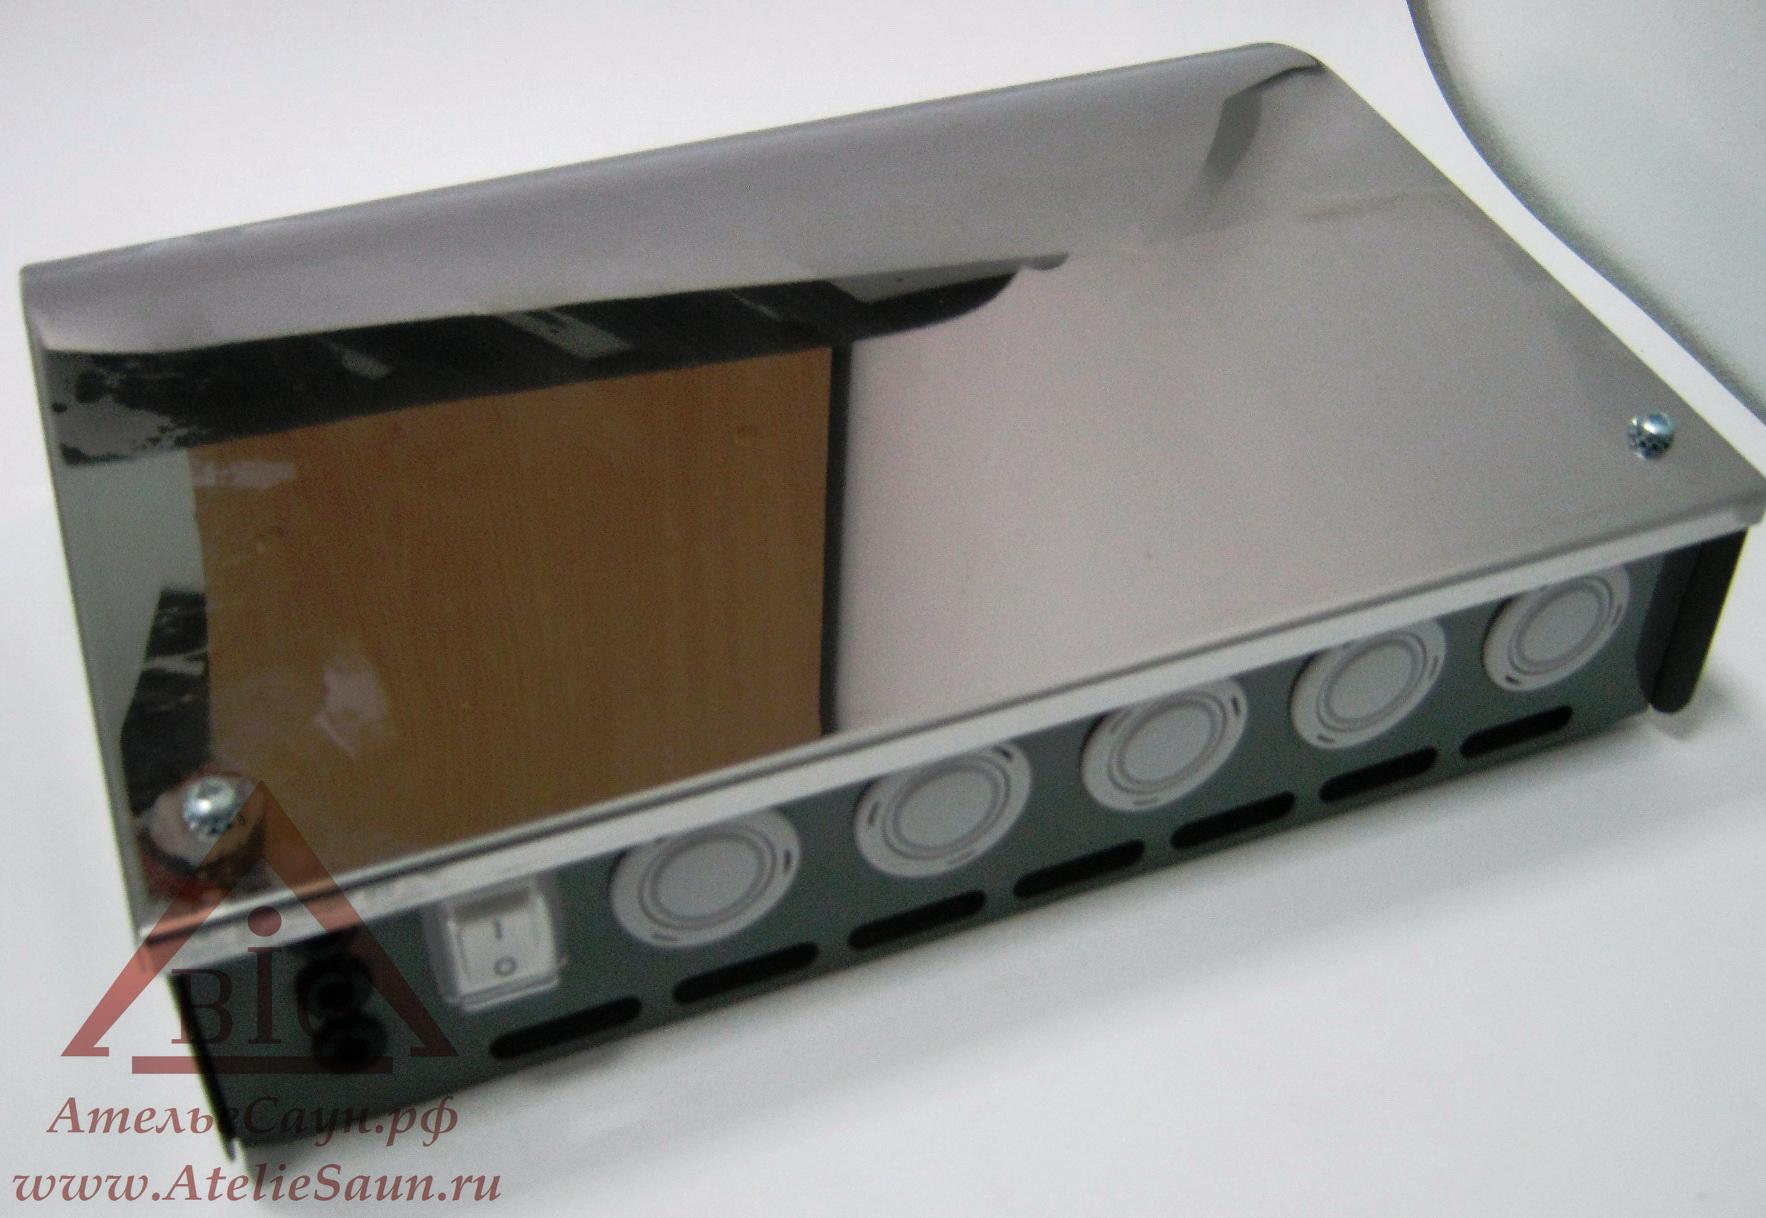 harvia sauna s схема блока управления